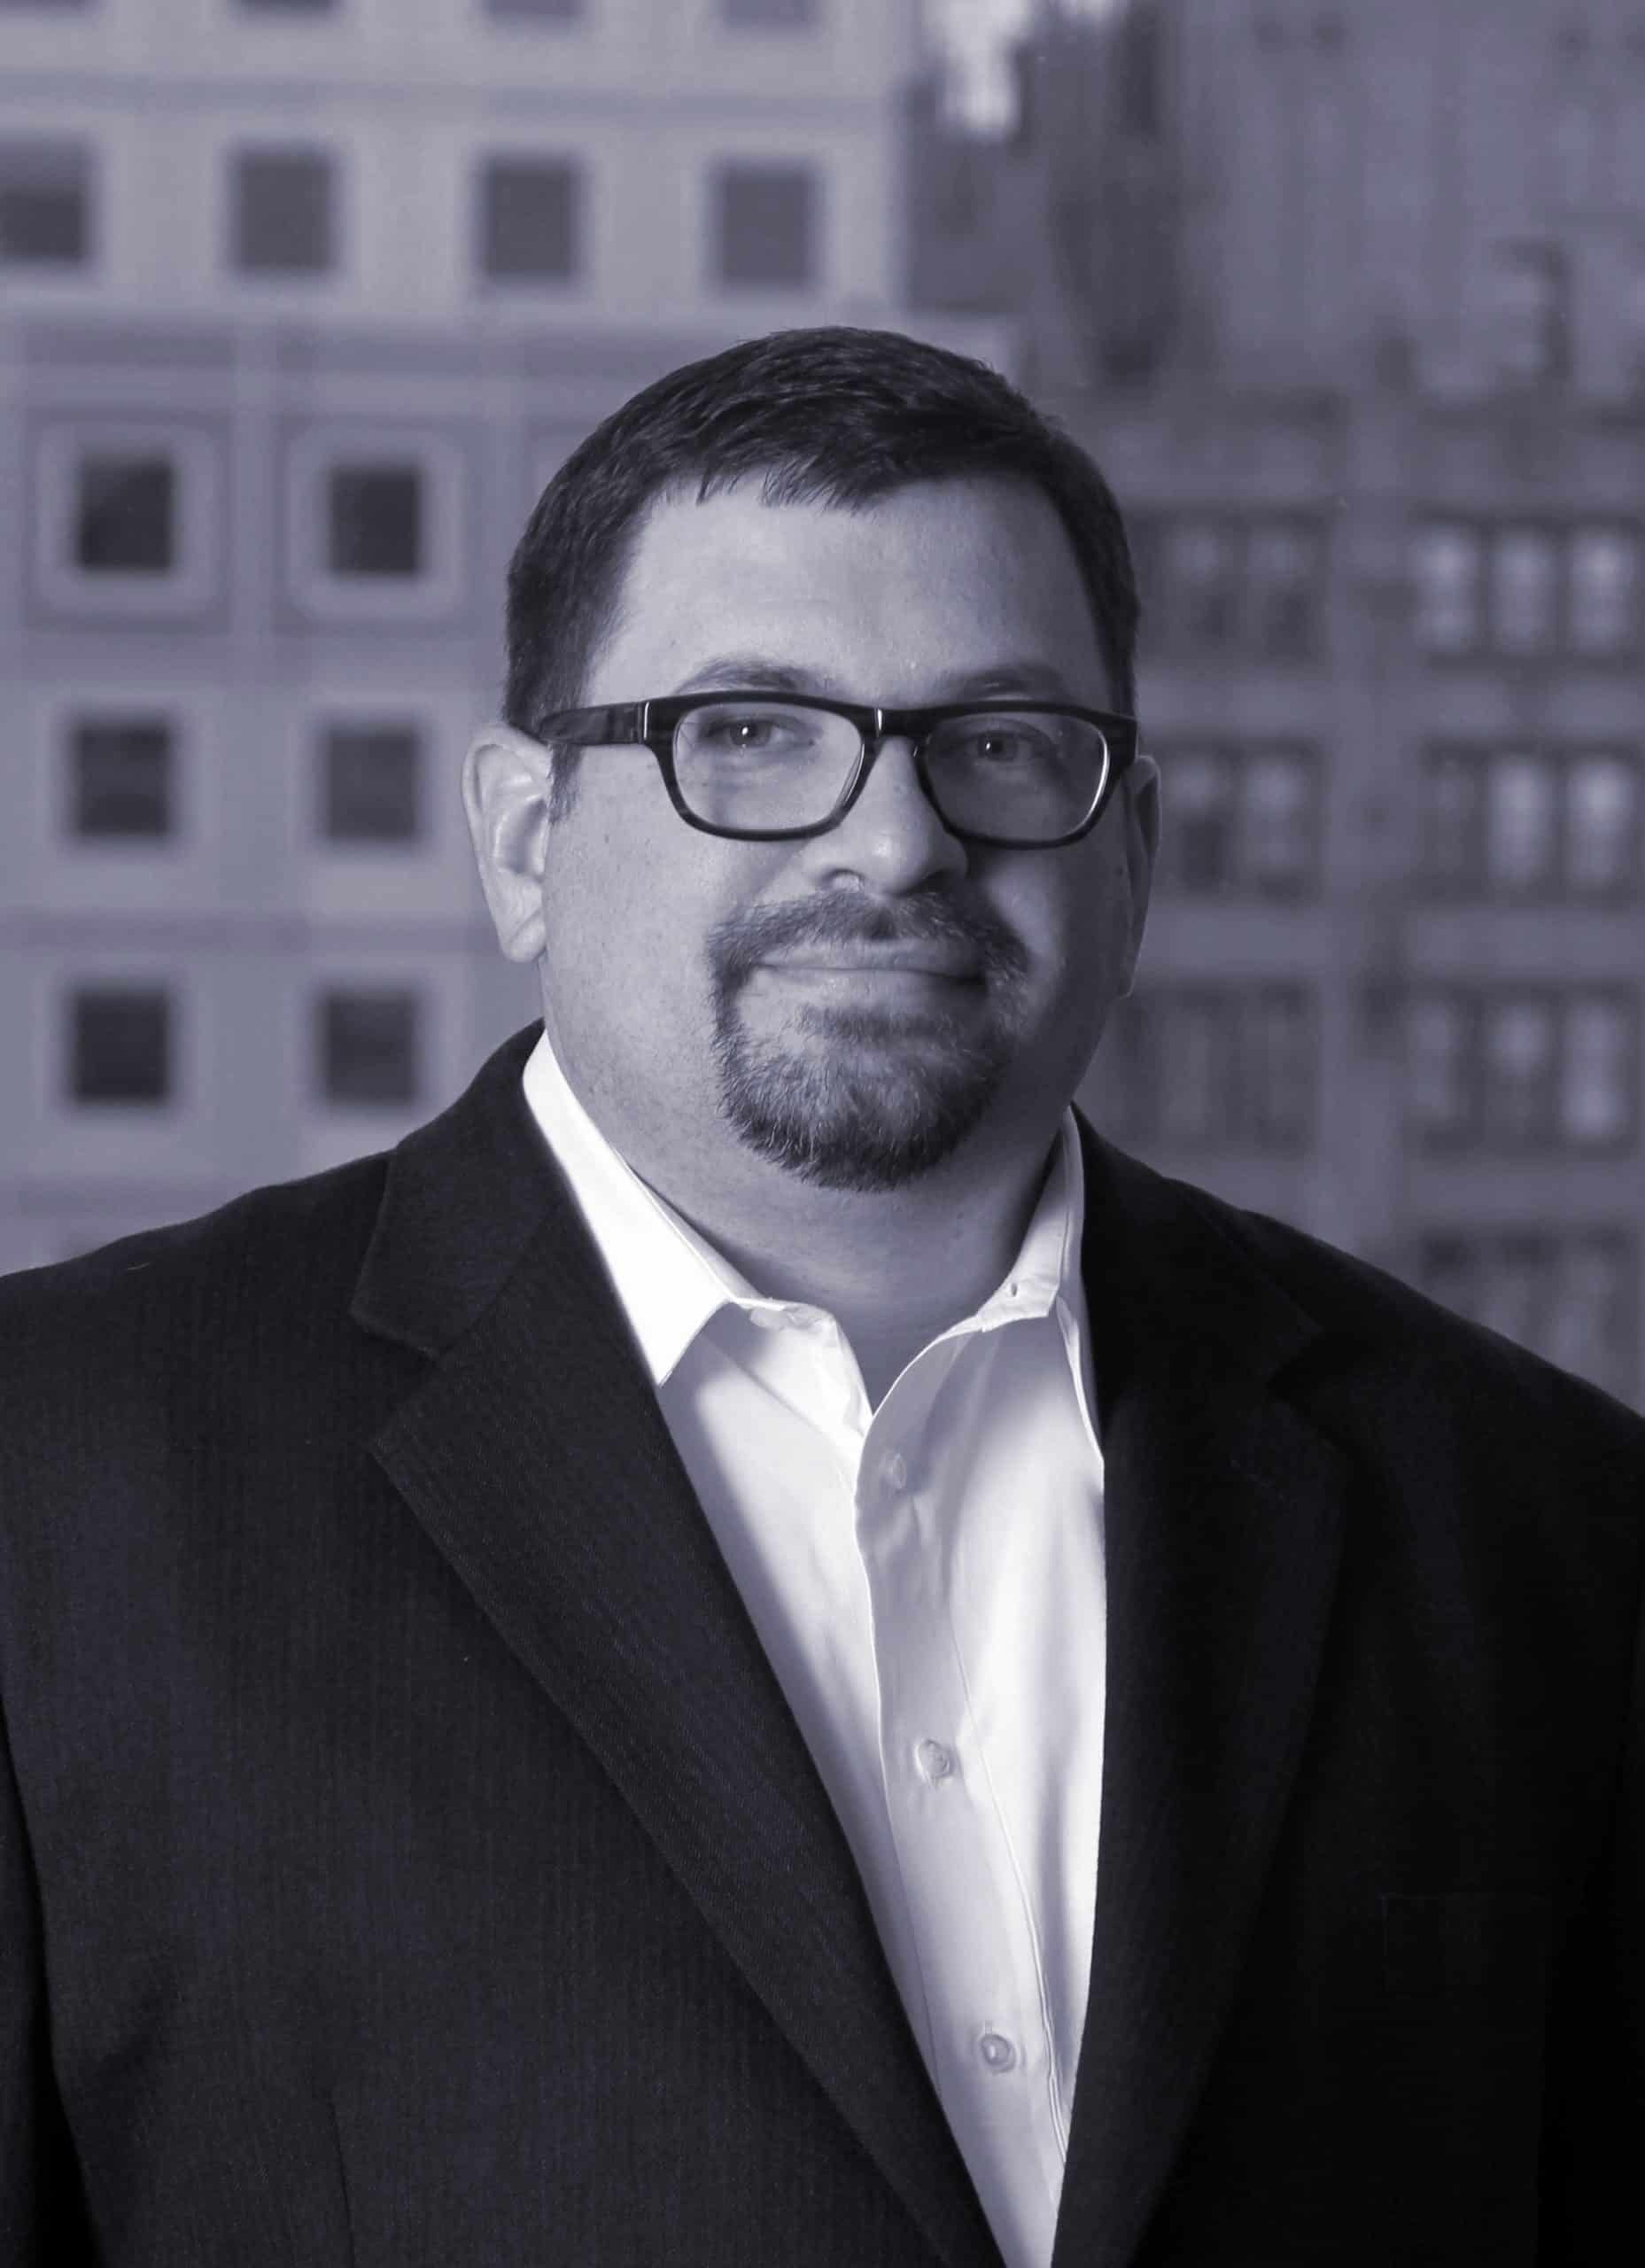 Dr. Sean Taylor